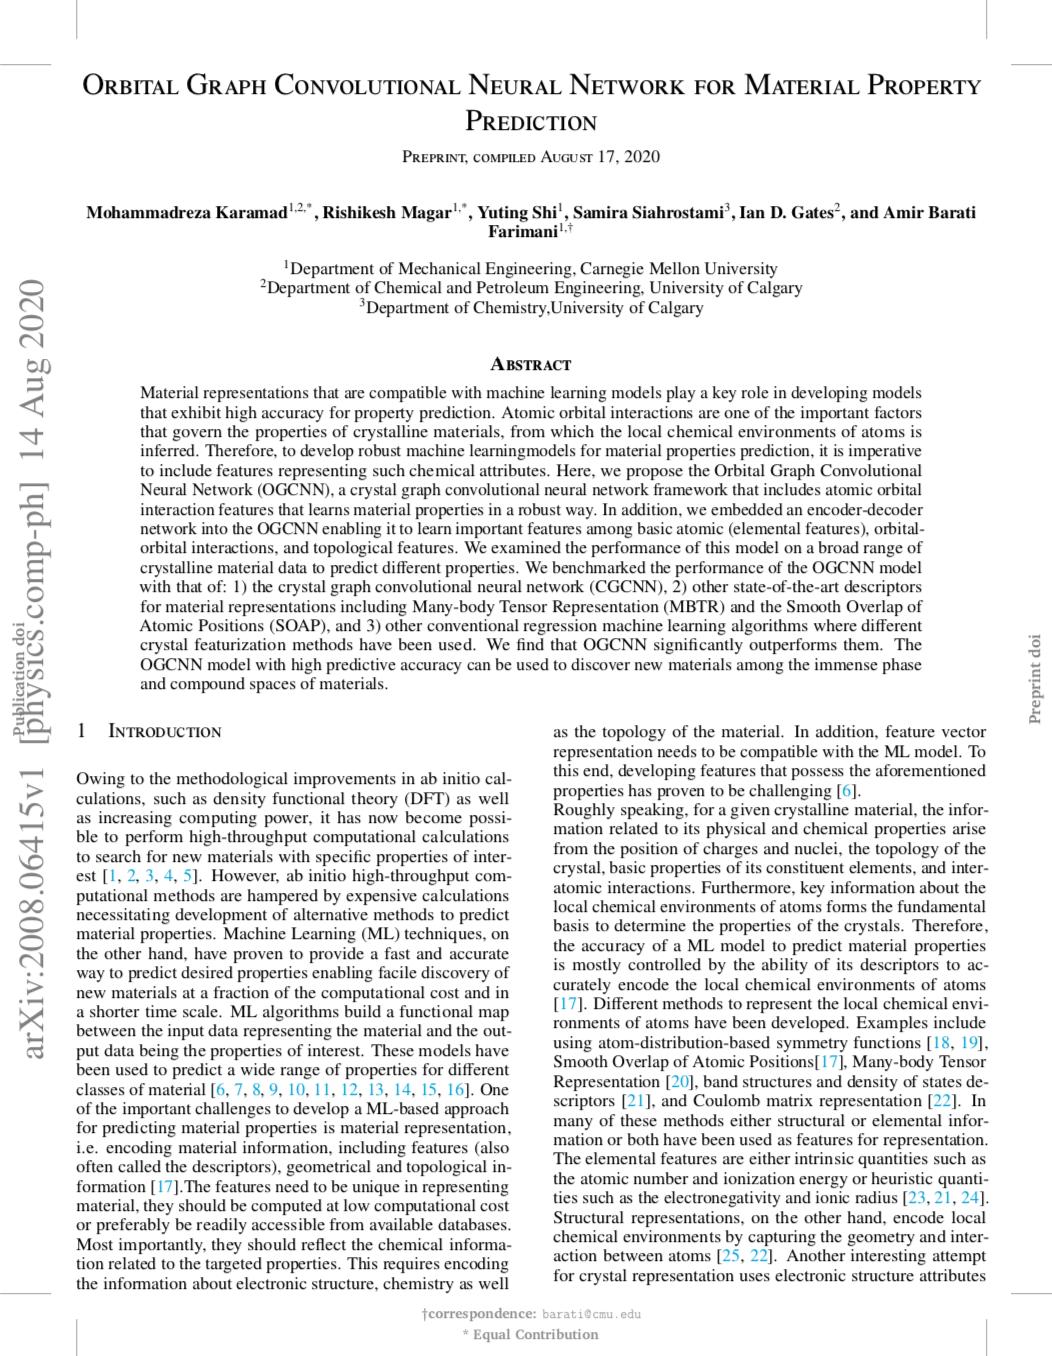 Orbital graph convolutional neural network for material property prediction